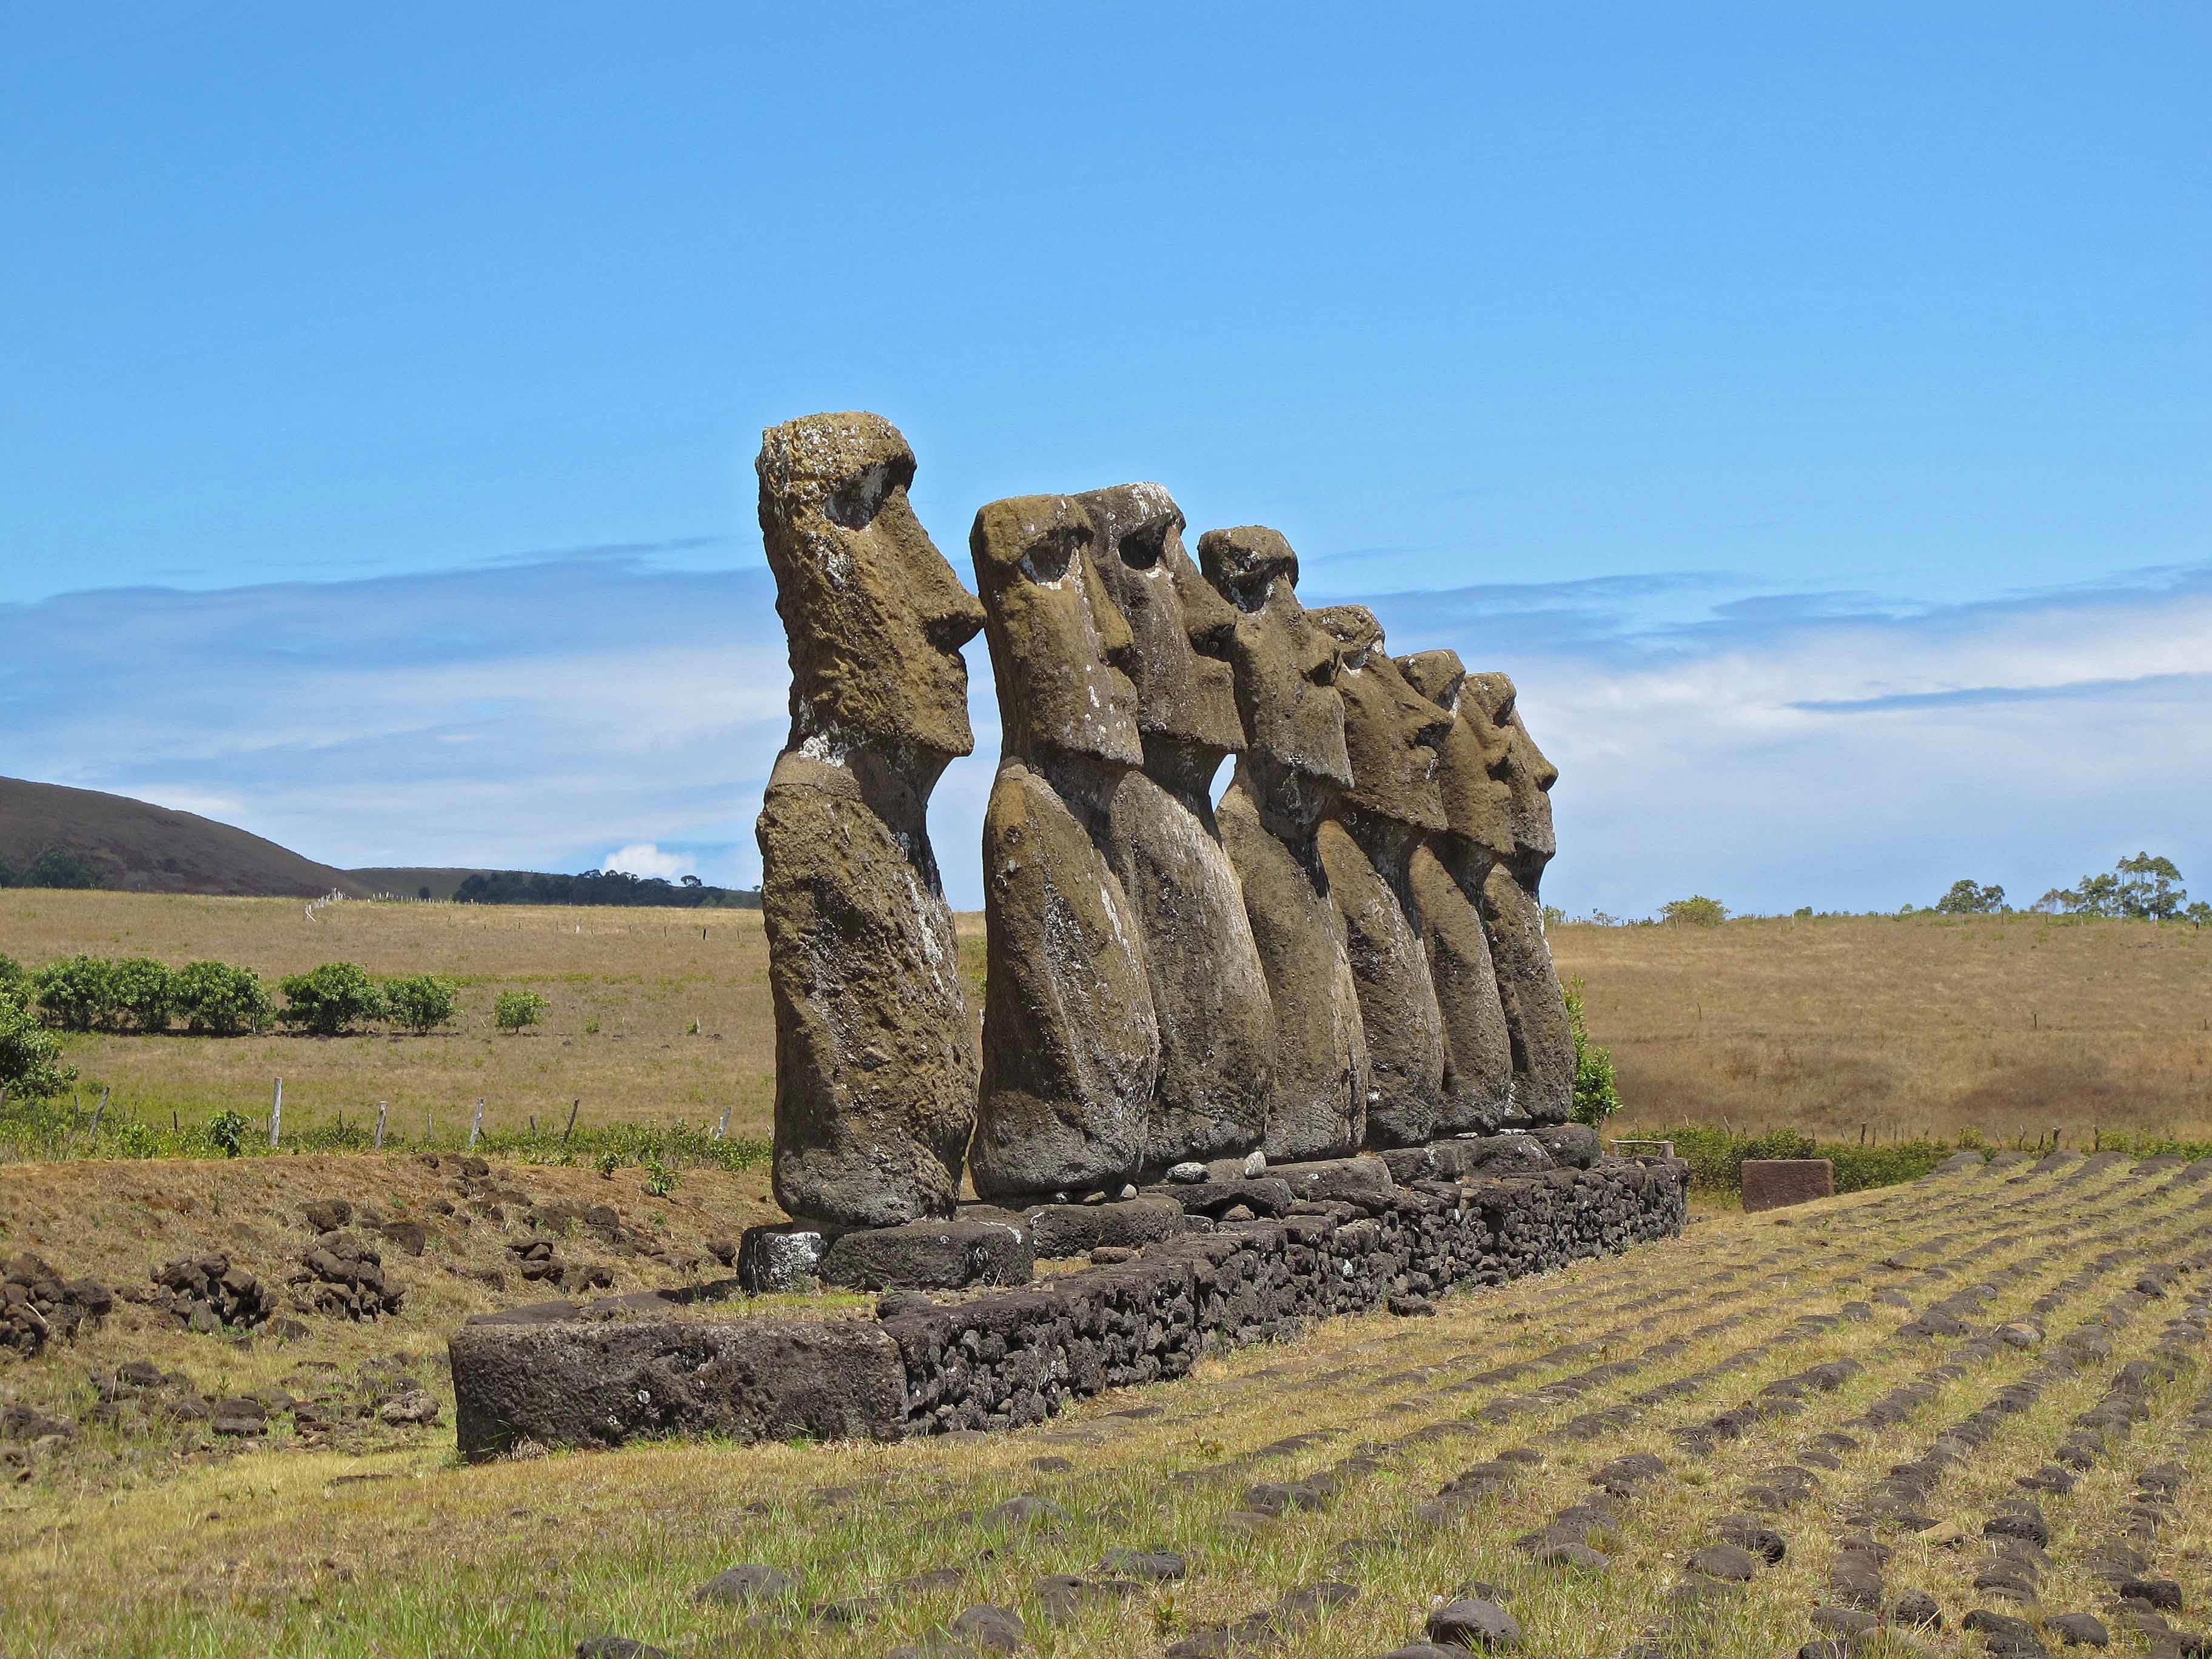 Statues - Iles de paques - Chili